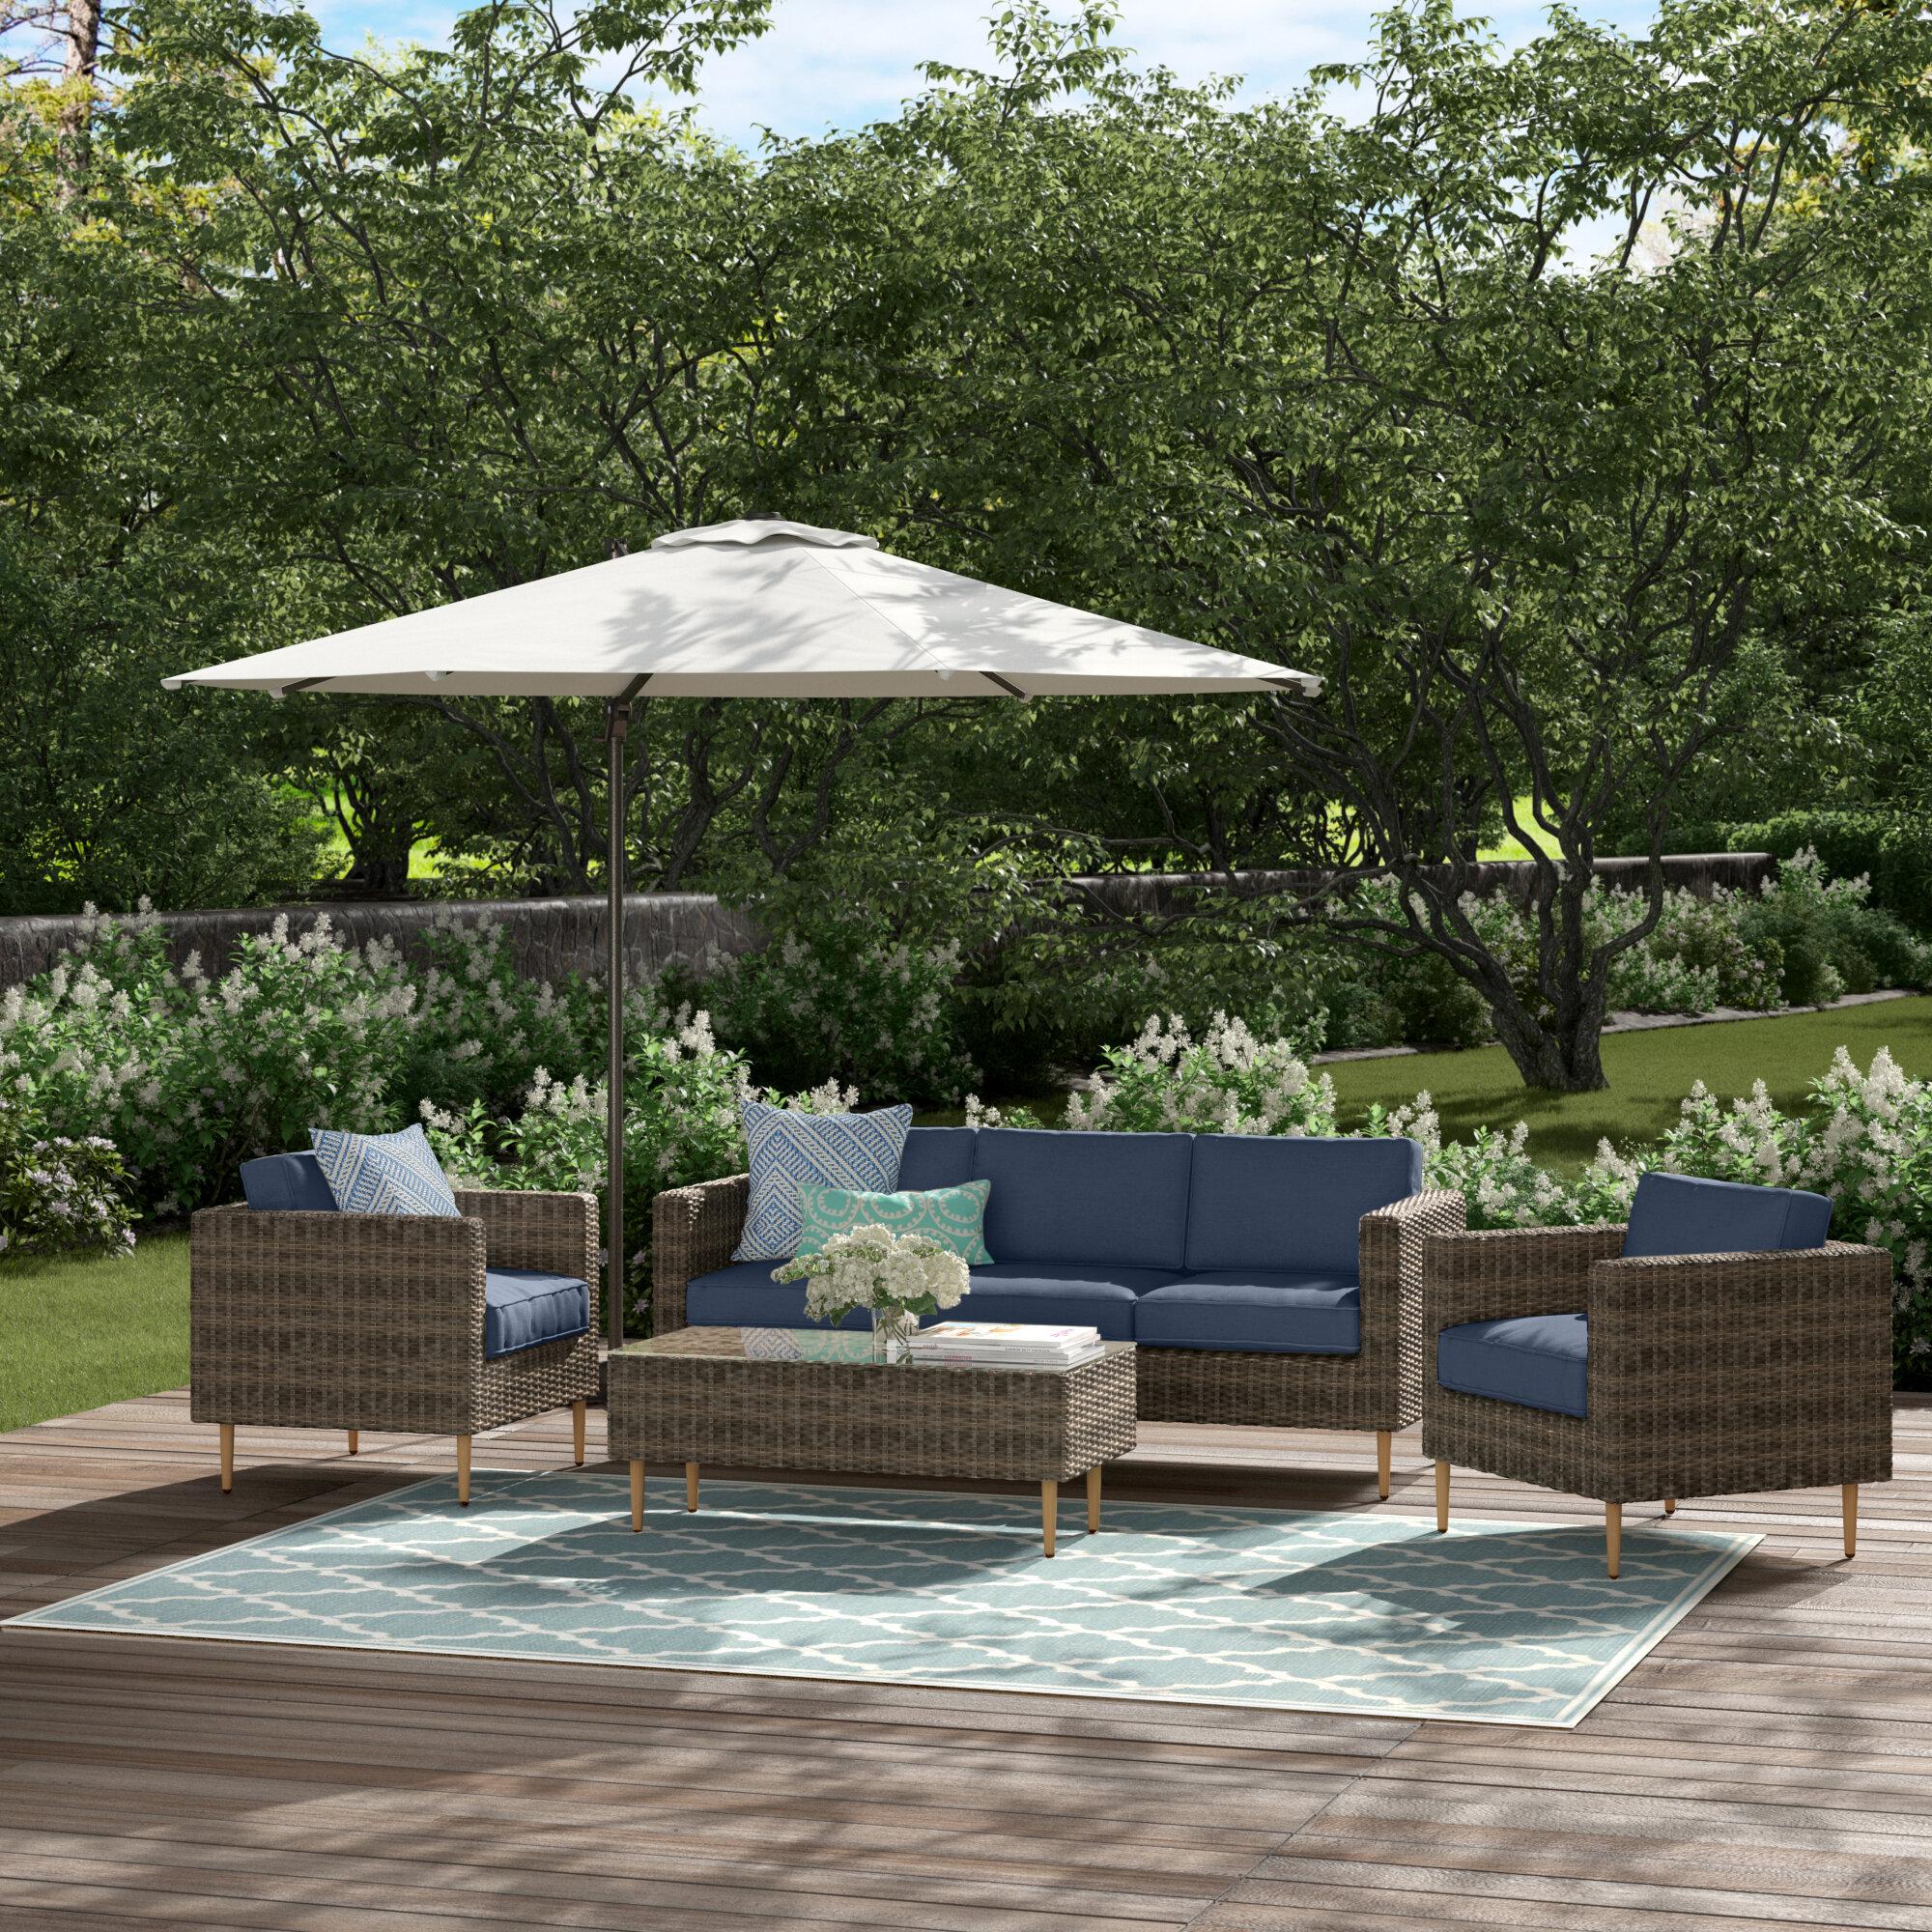 Rowley 4 Piece Rattan Sofa Seating Group With Cushions Reviews Joss Main